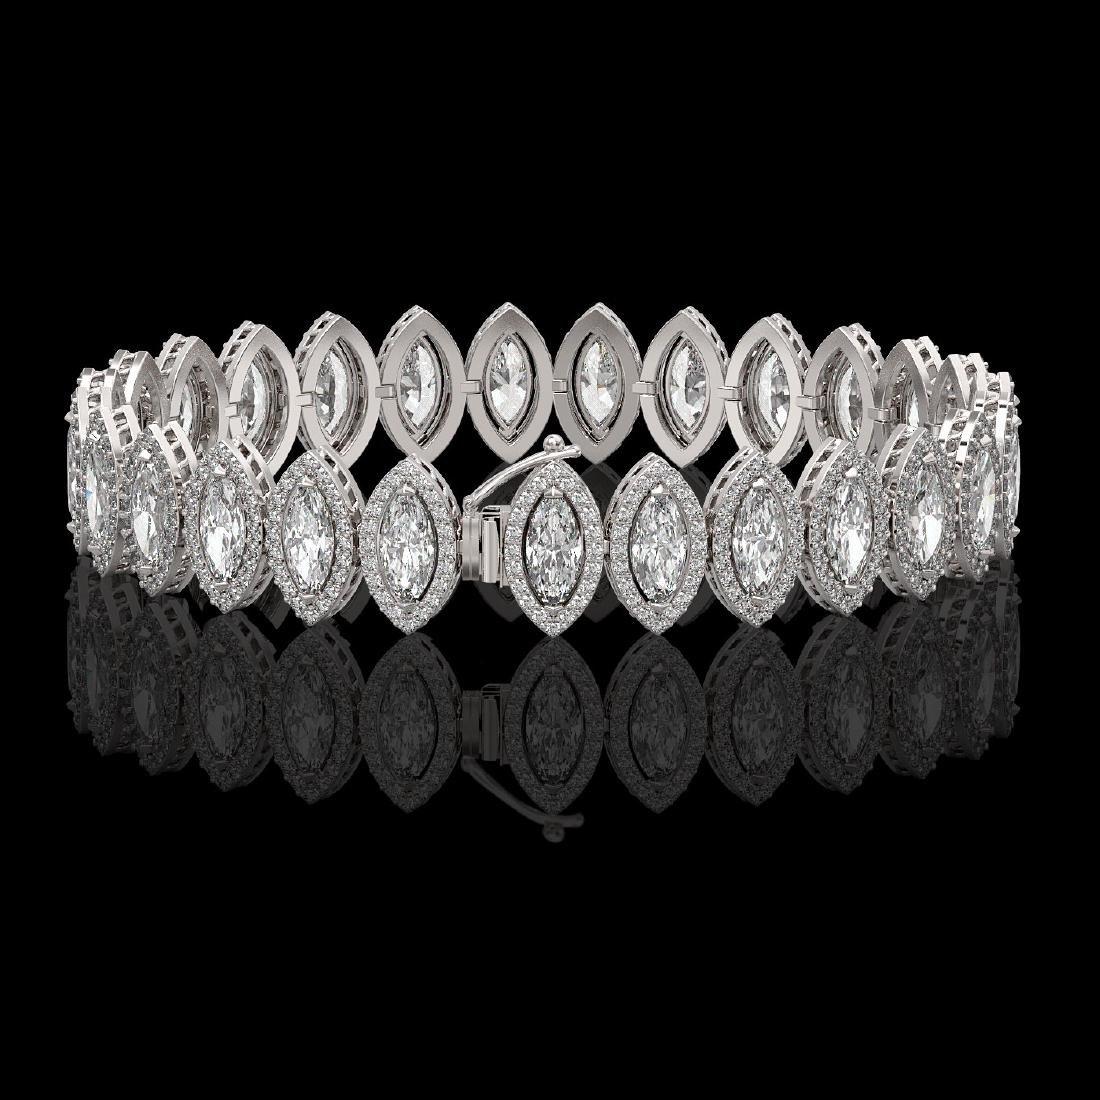 17.55 CTW Marquise Diamond Designer Bracelet 18K White - 2